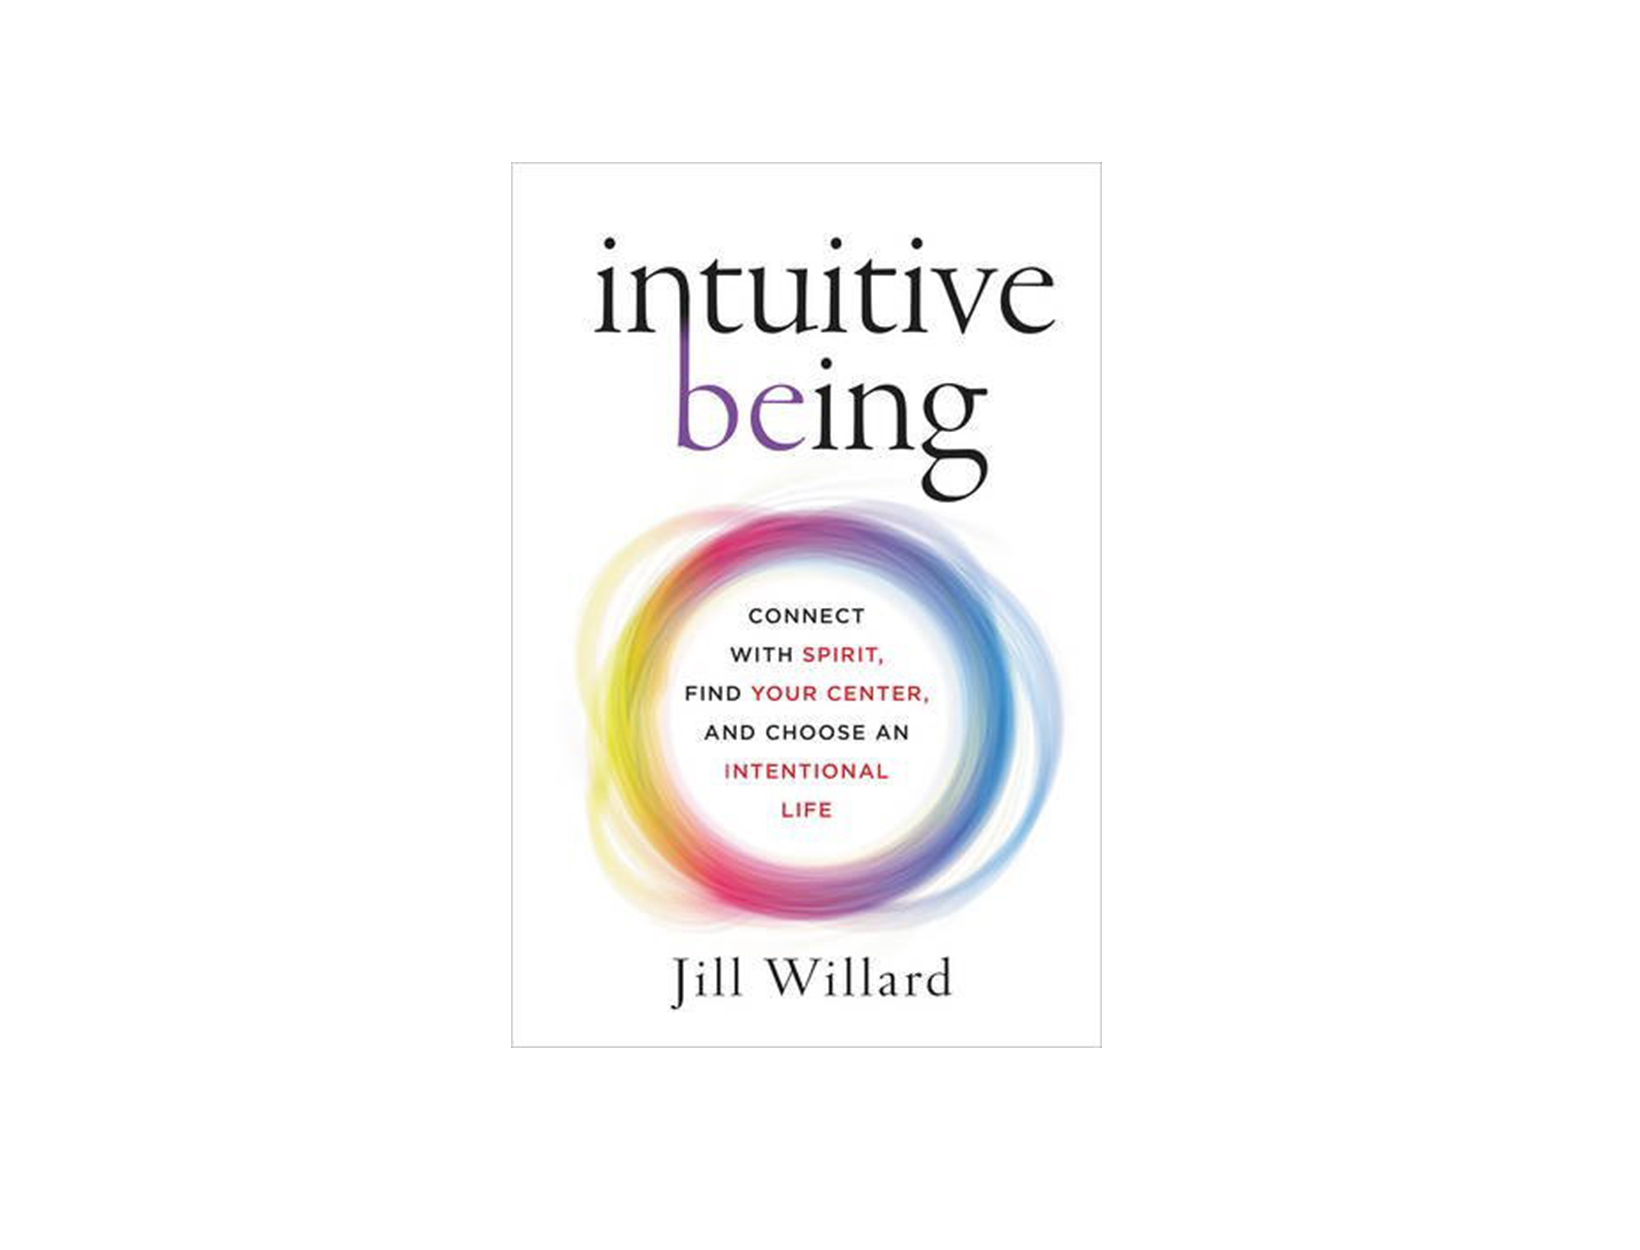 Intuitive Being by Jill Willard